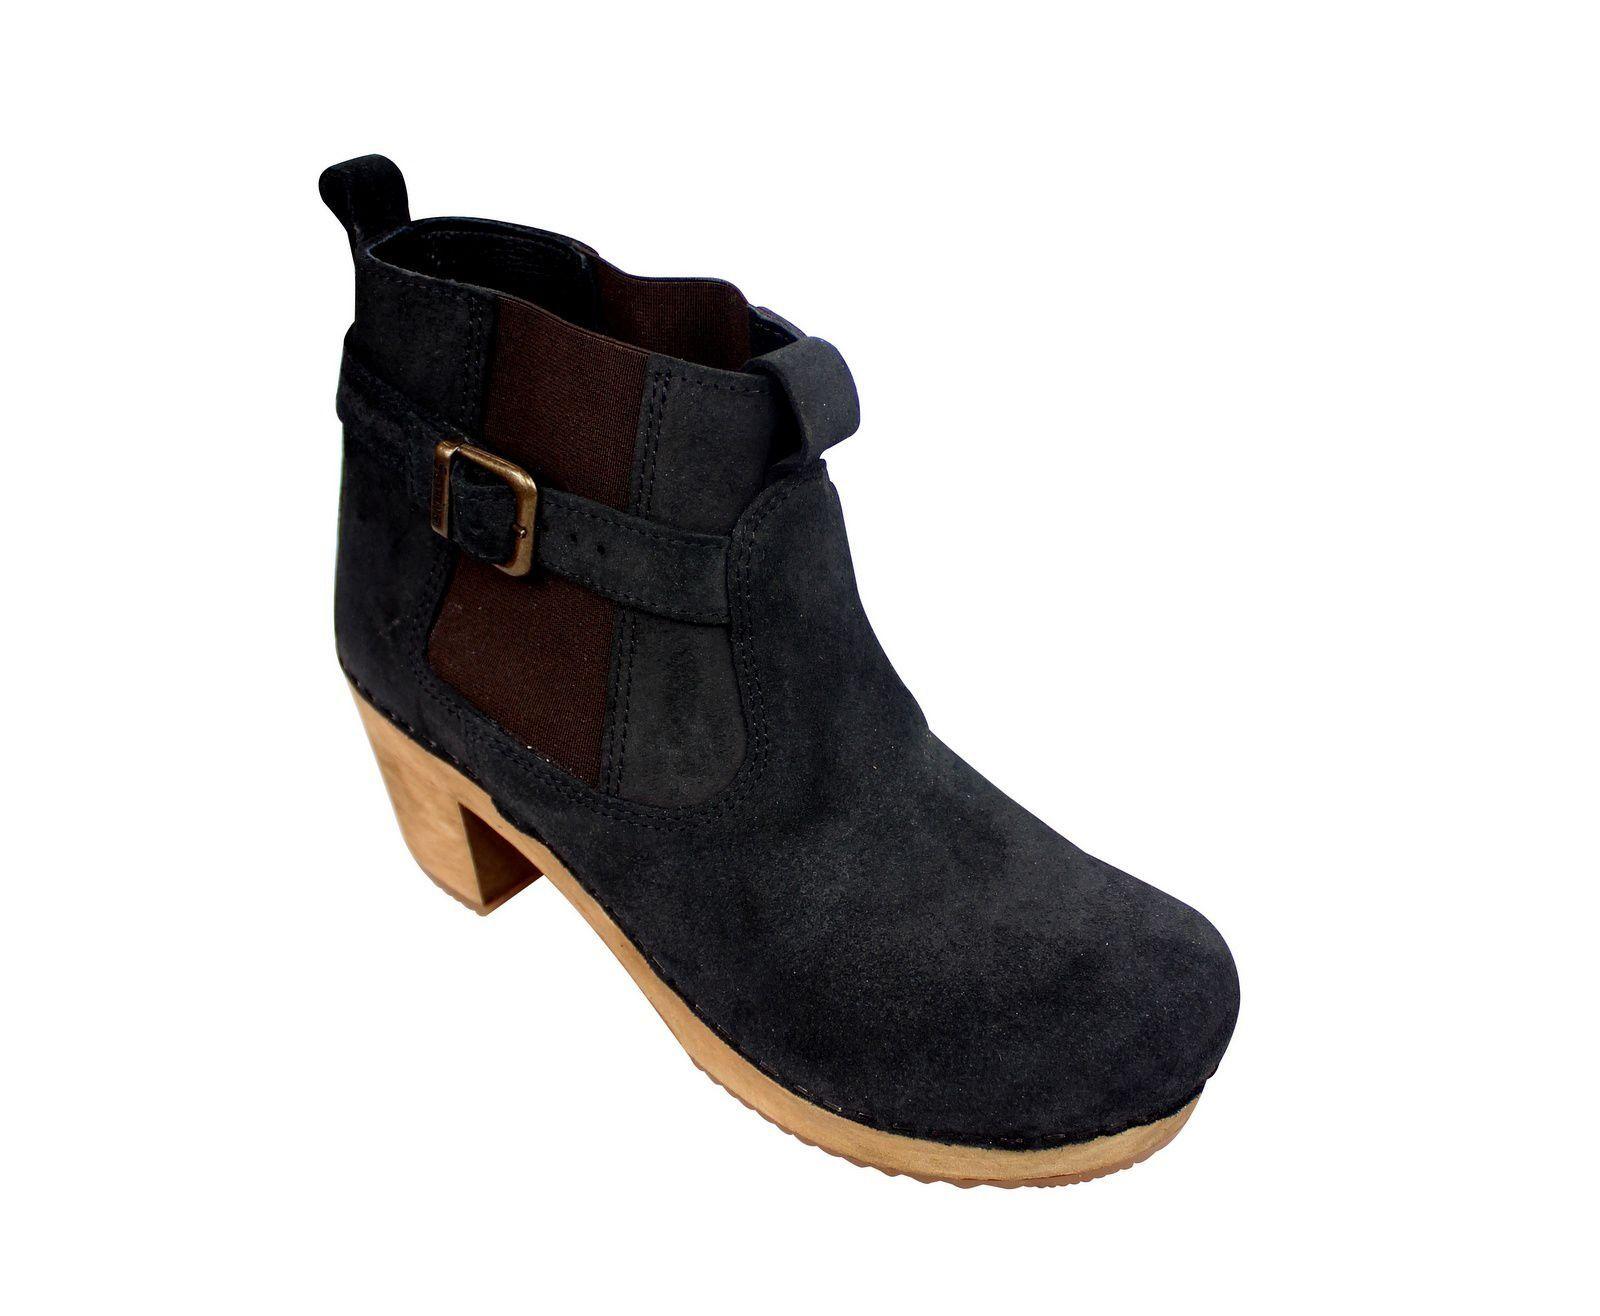 Sanita Peggy Sue Jodphur style ankle boots Black